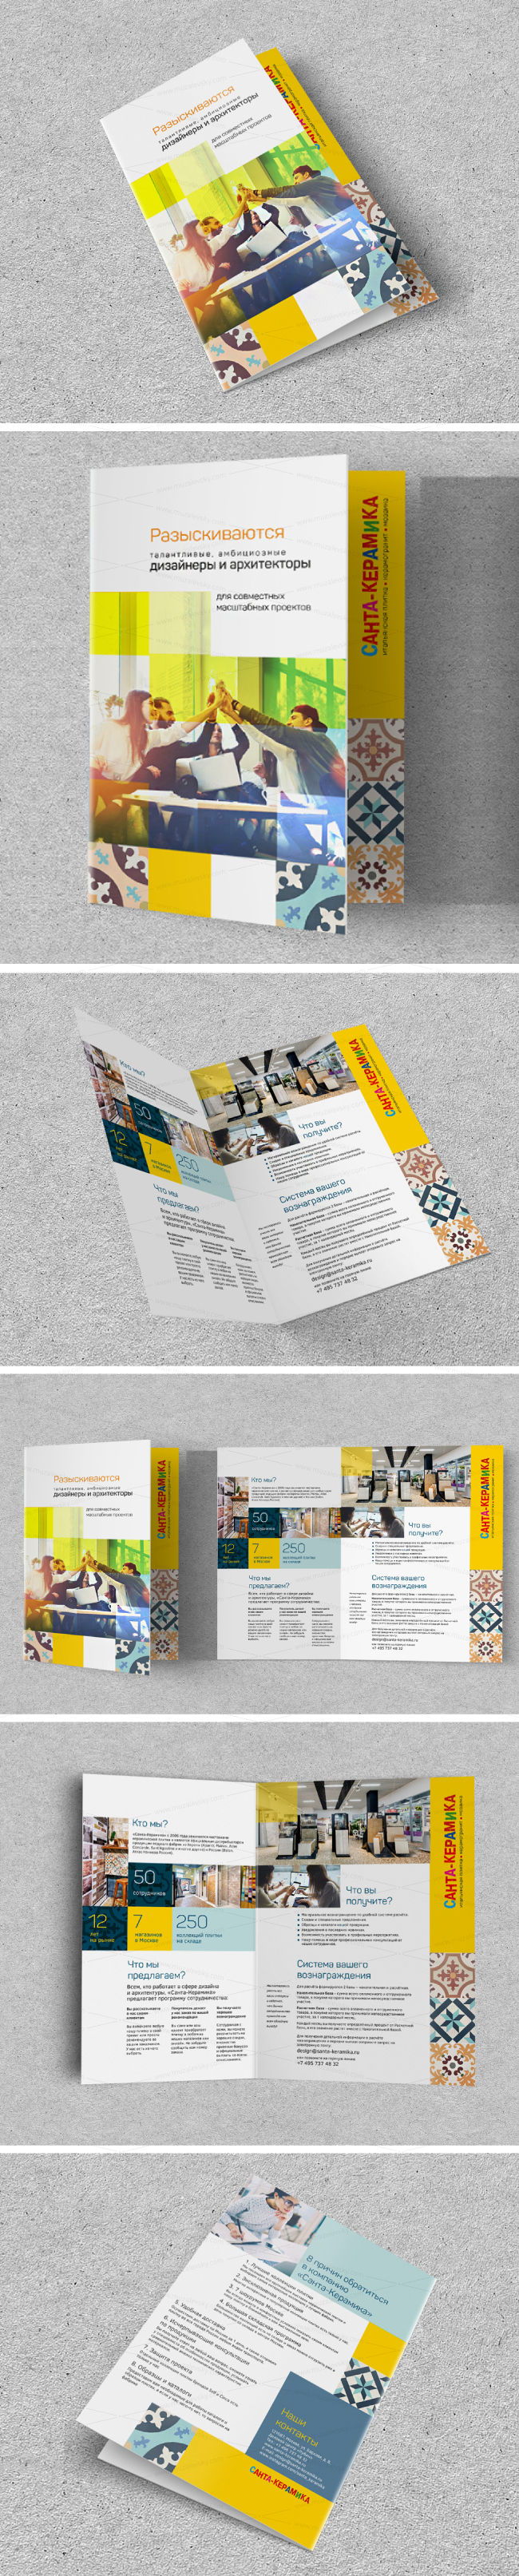 Booklet-Santa-keramika-my